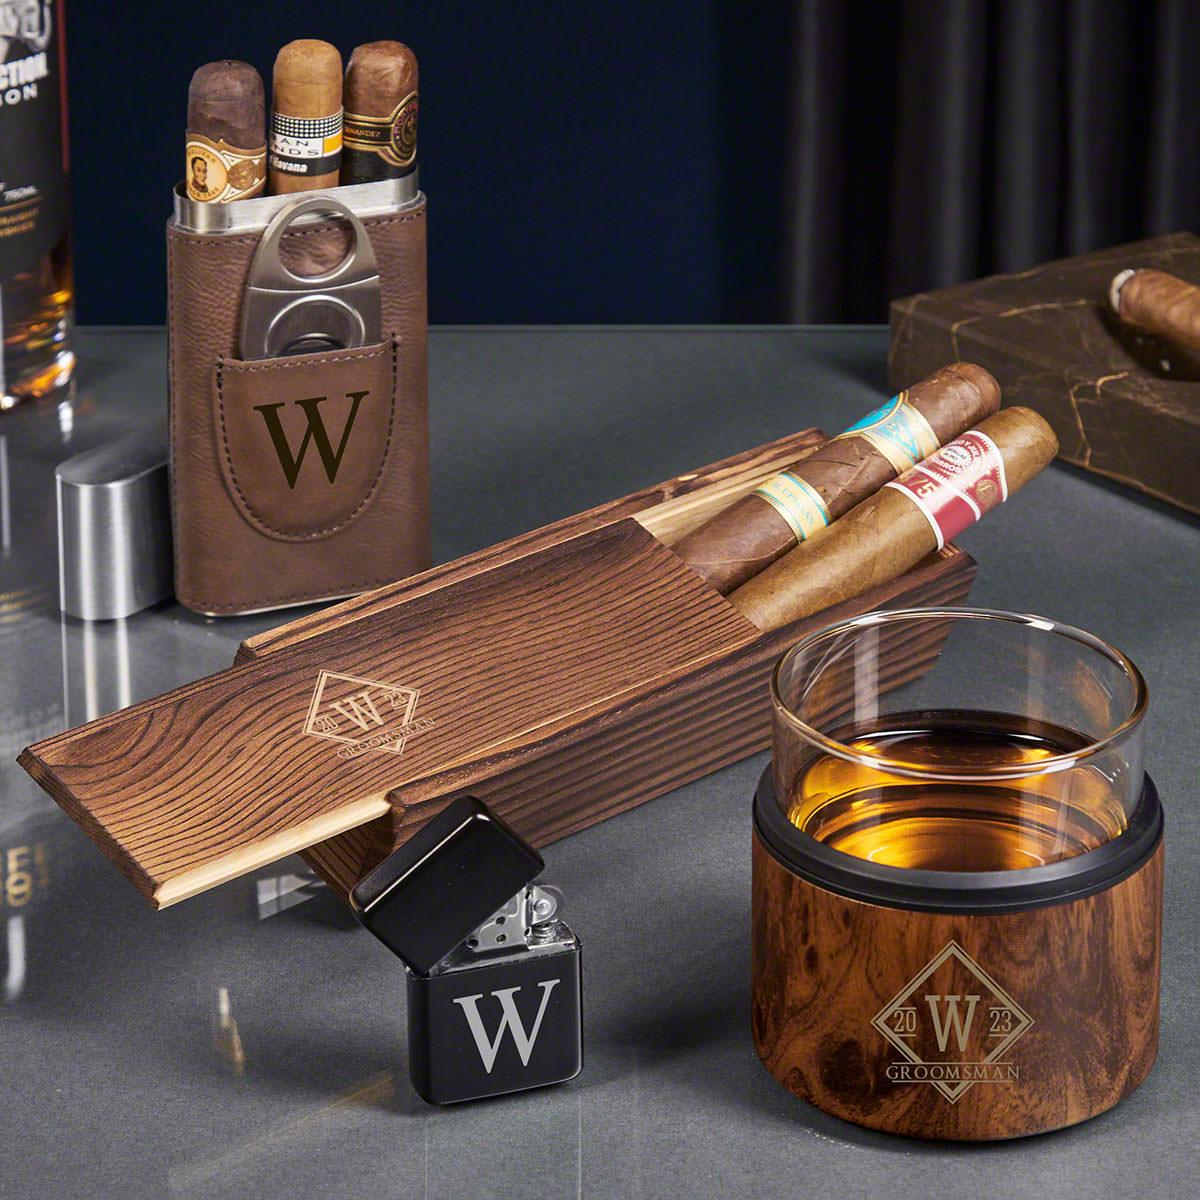 Drake Personalized Whiskey Kuzie and Cigar Gift Set